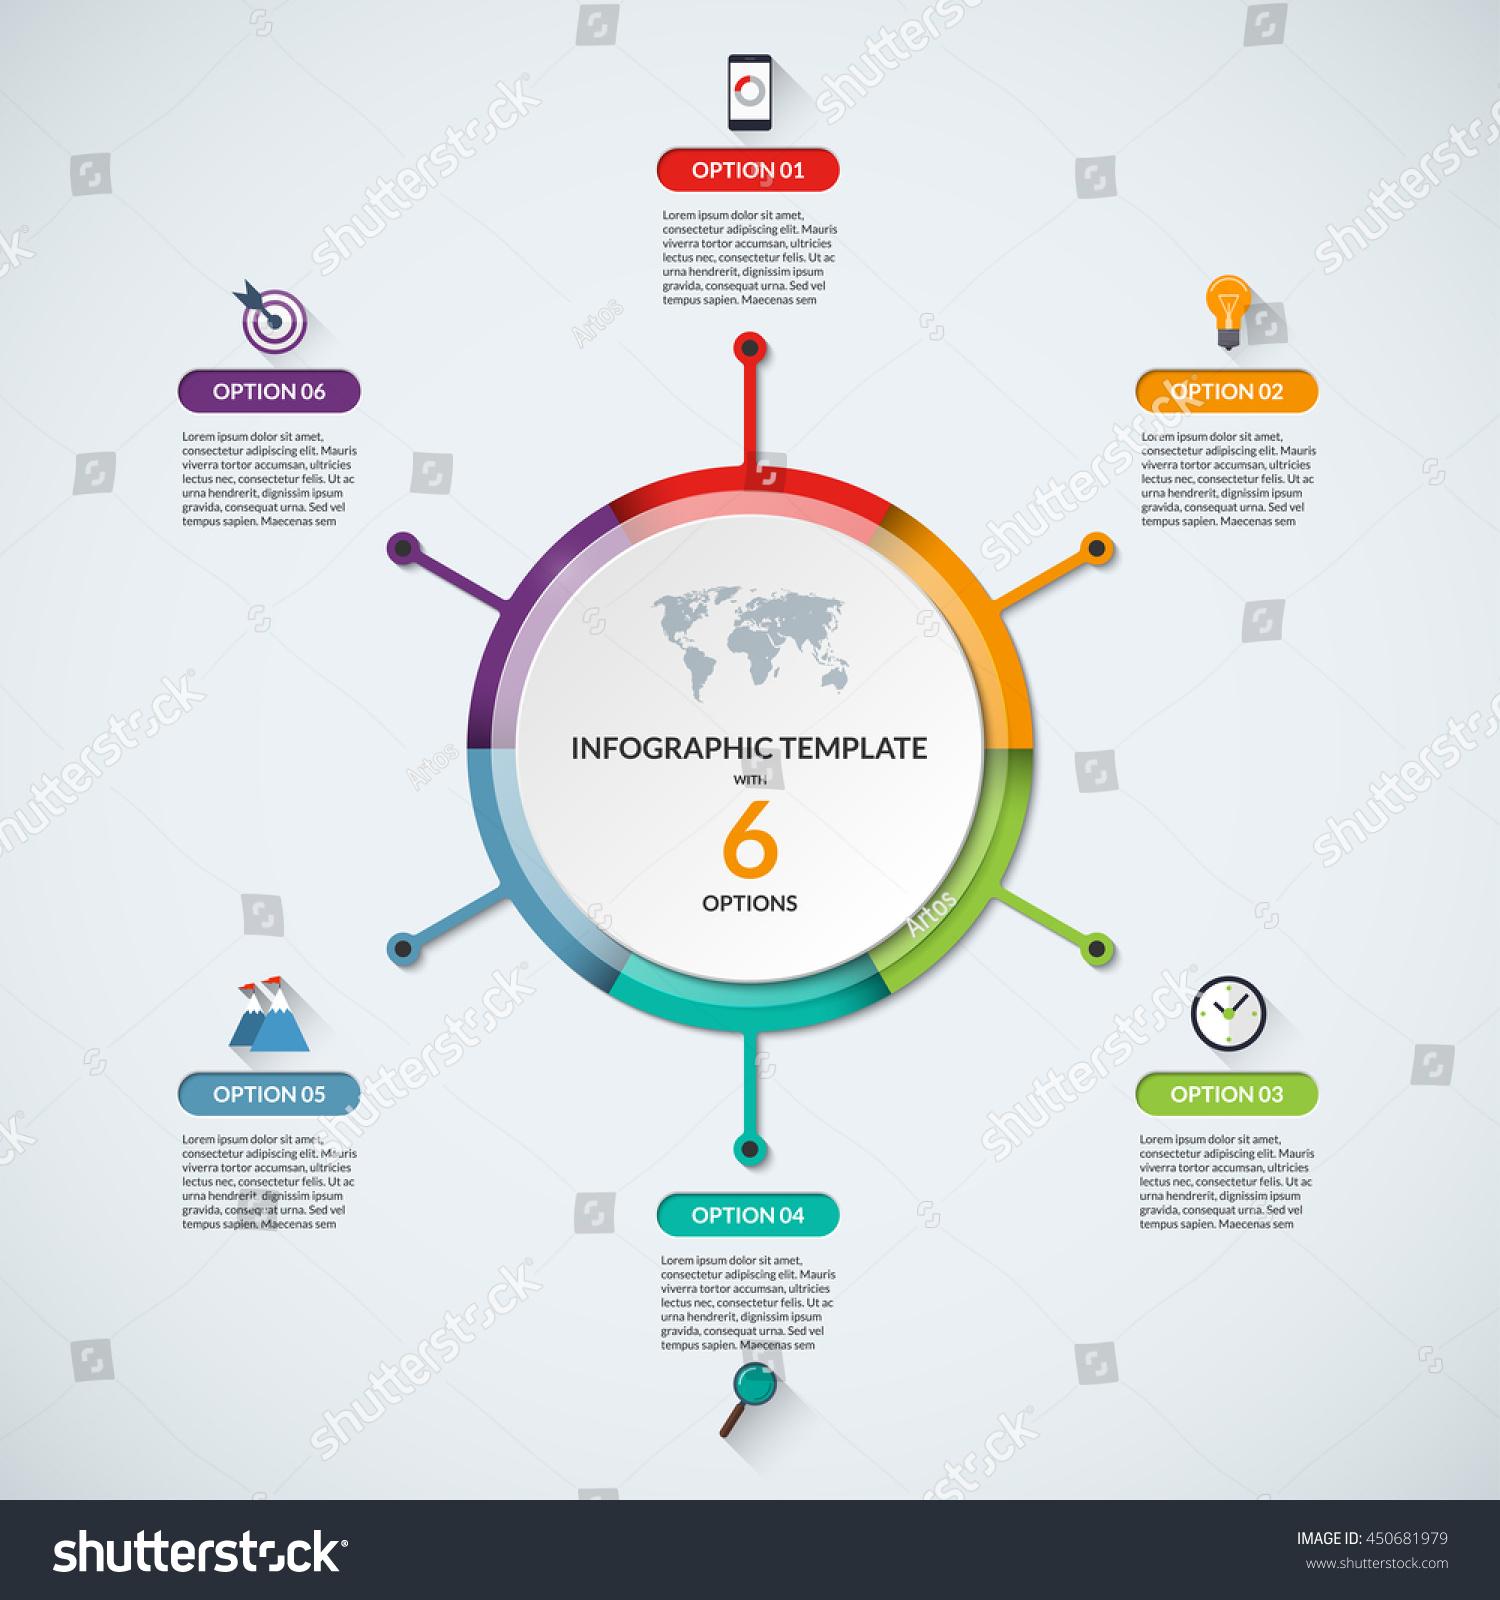 Infographic circle diagram template business concept stock vector infographic circle diagram template business concept stock vector 450681979 shutterstock maxwellsz